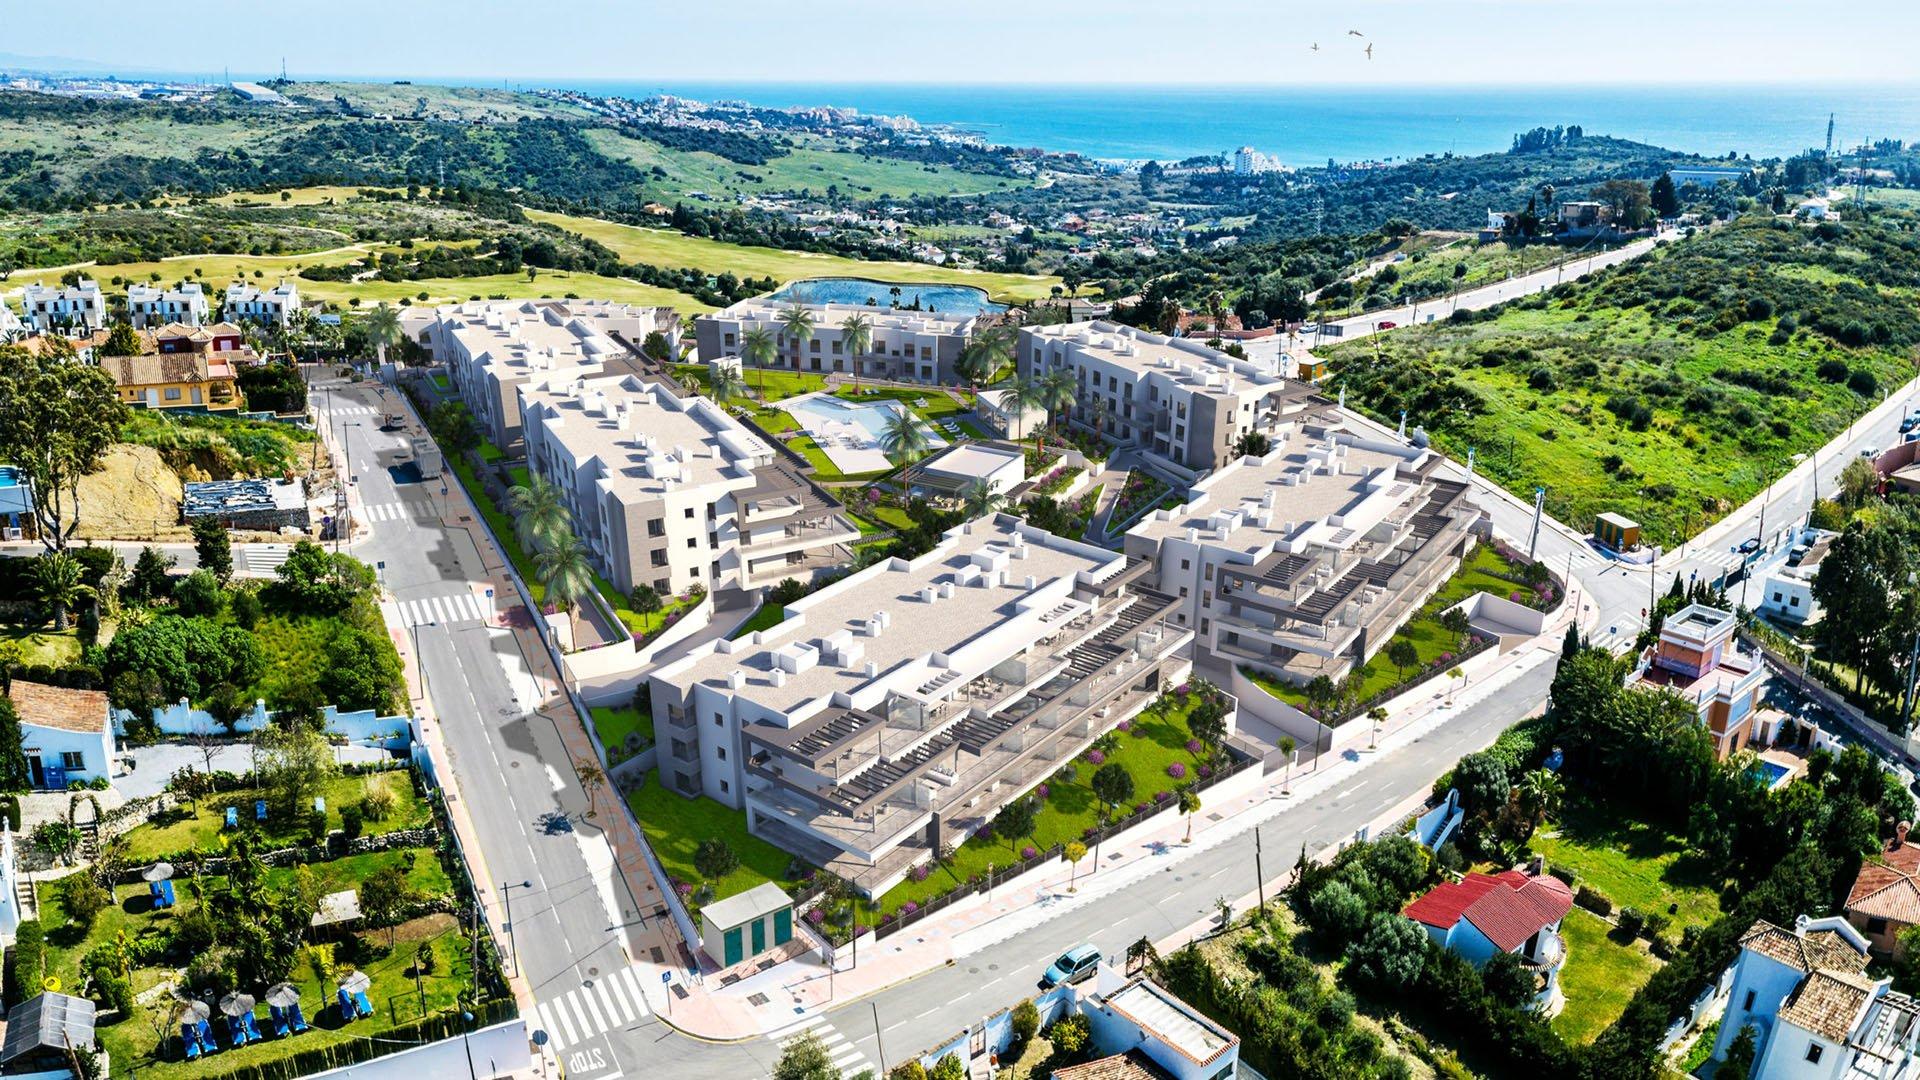 Habitat Valle Romano: Apartments in Estepona next to the sea and golf